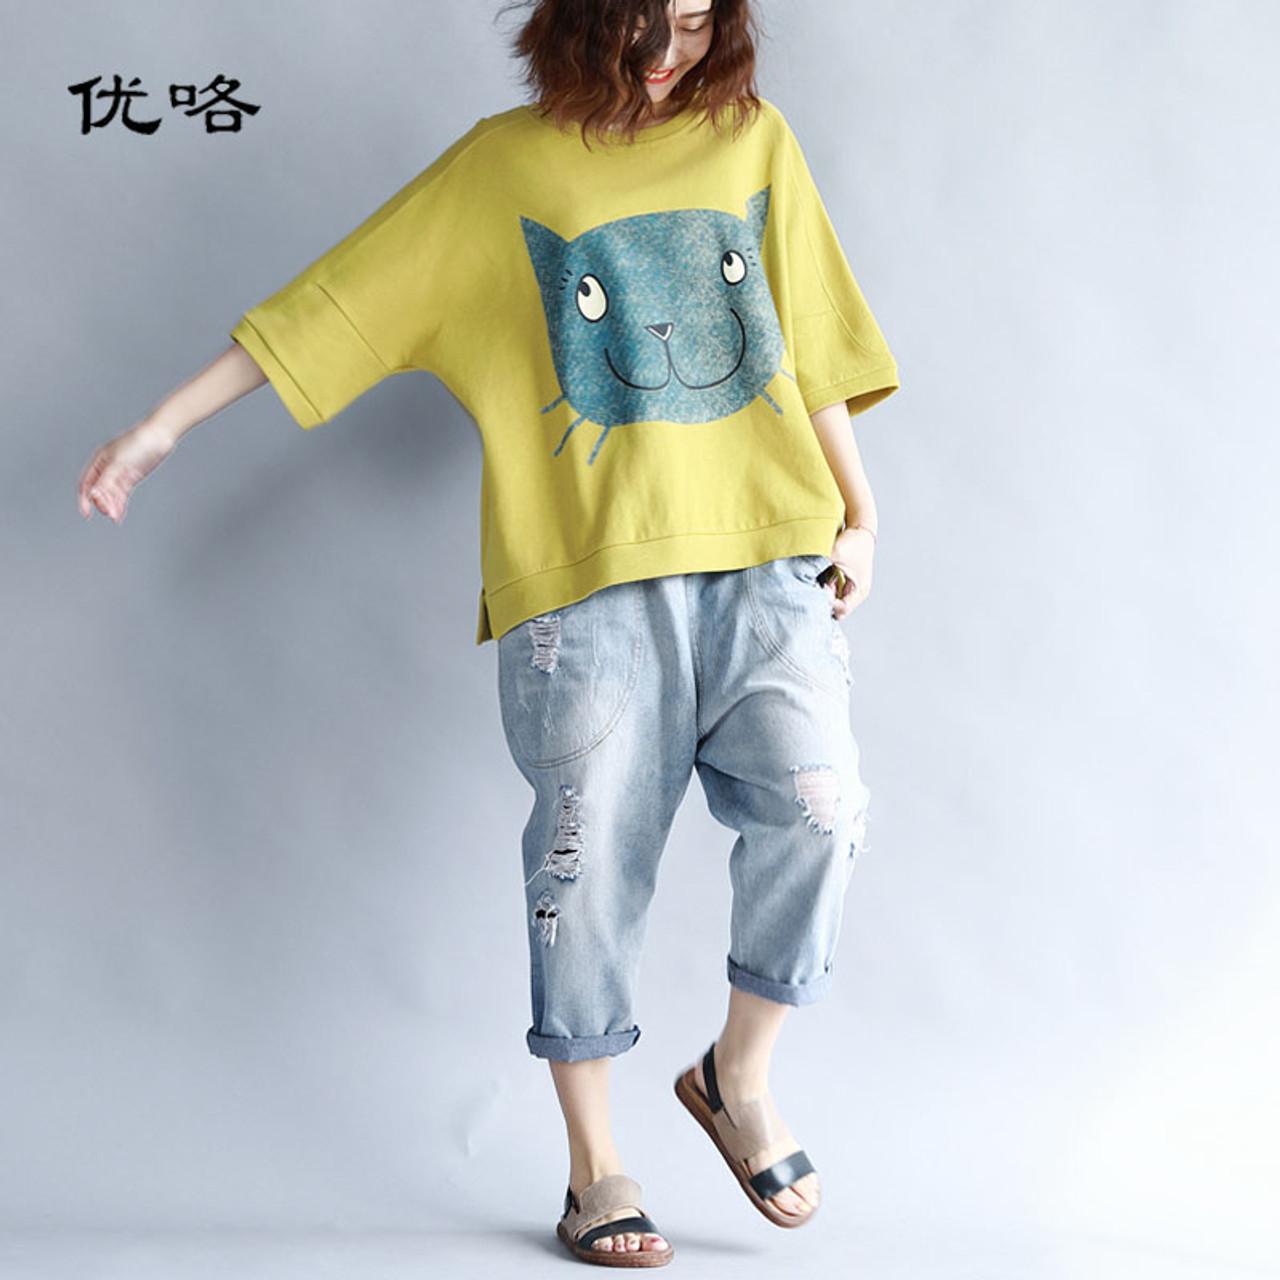 10a88a4640 2019 Summer Women Korean Cotton T Shirt Kawaii Cartoon Cat Print Tshirt  Women Plus Size Casual ...